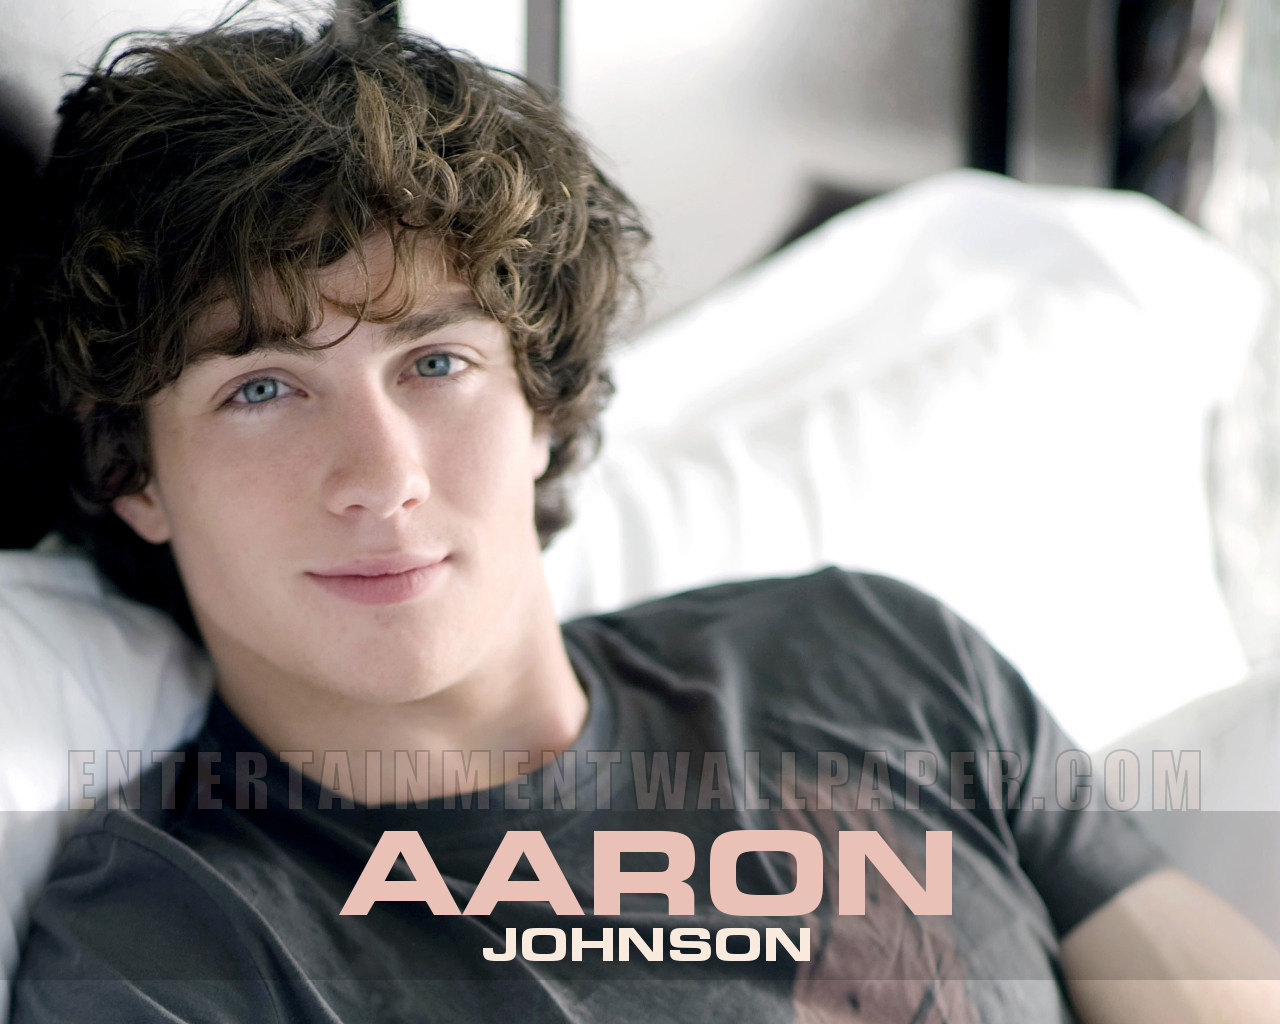 AARON JOHNSON Aaron-Johnson-aaron-johnson-26581162-1280-1024